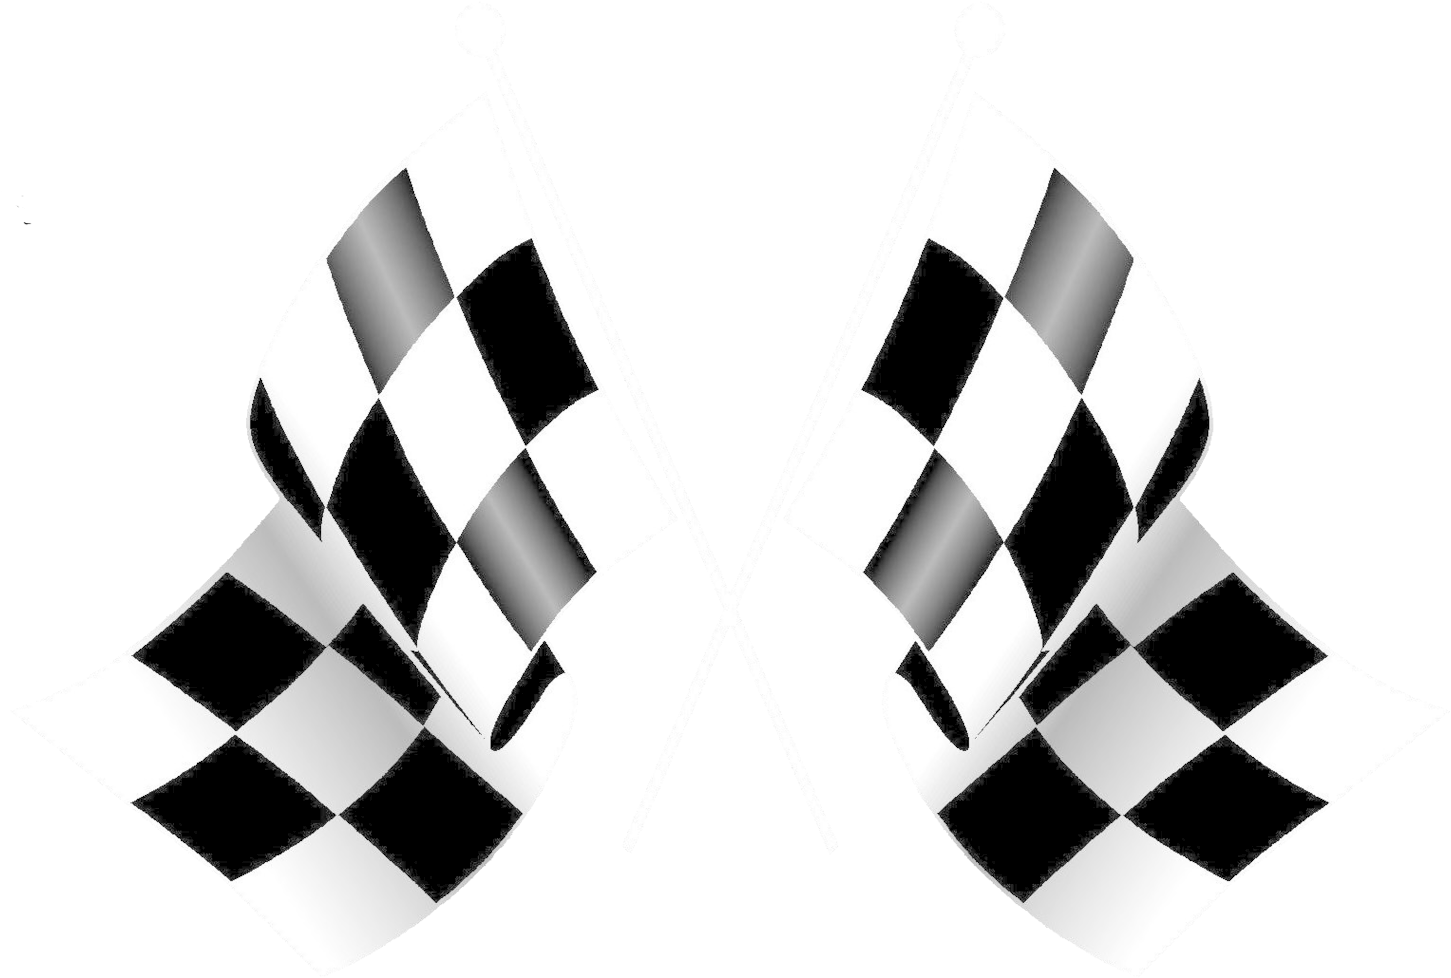 Racing Flags Clip Art - Checkered Flag Transparent ...